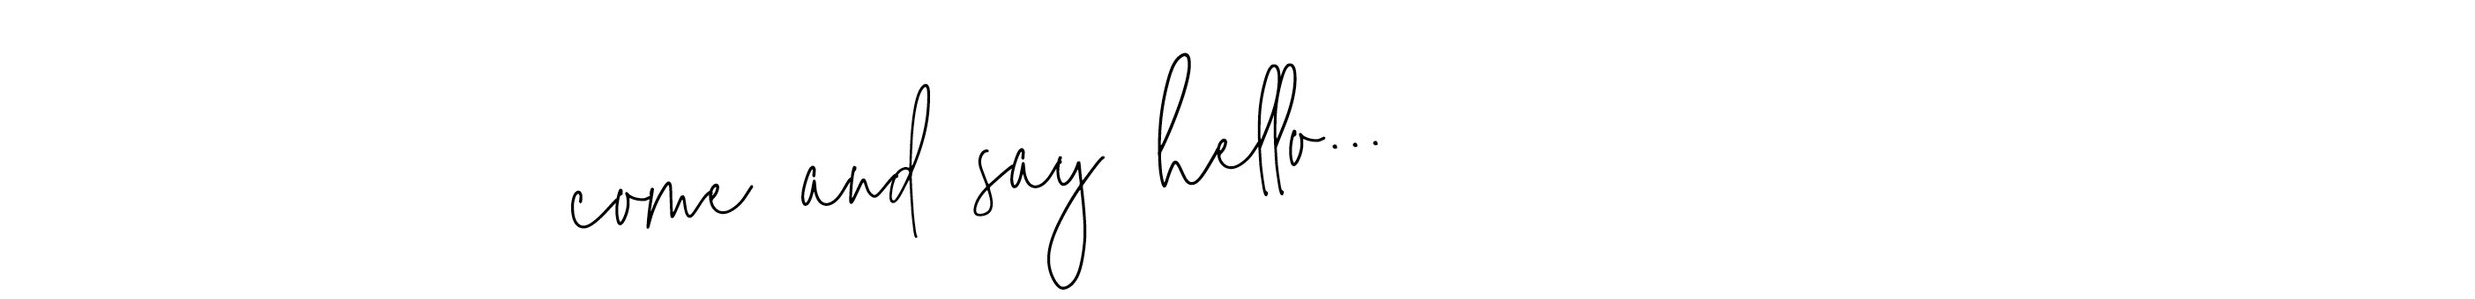 come and say hello.jpg